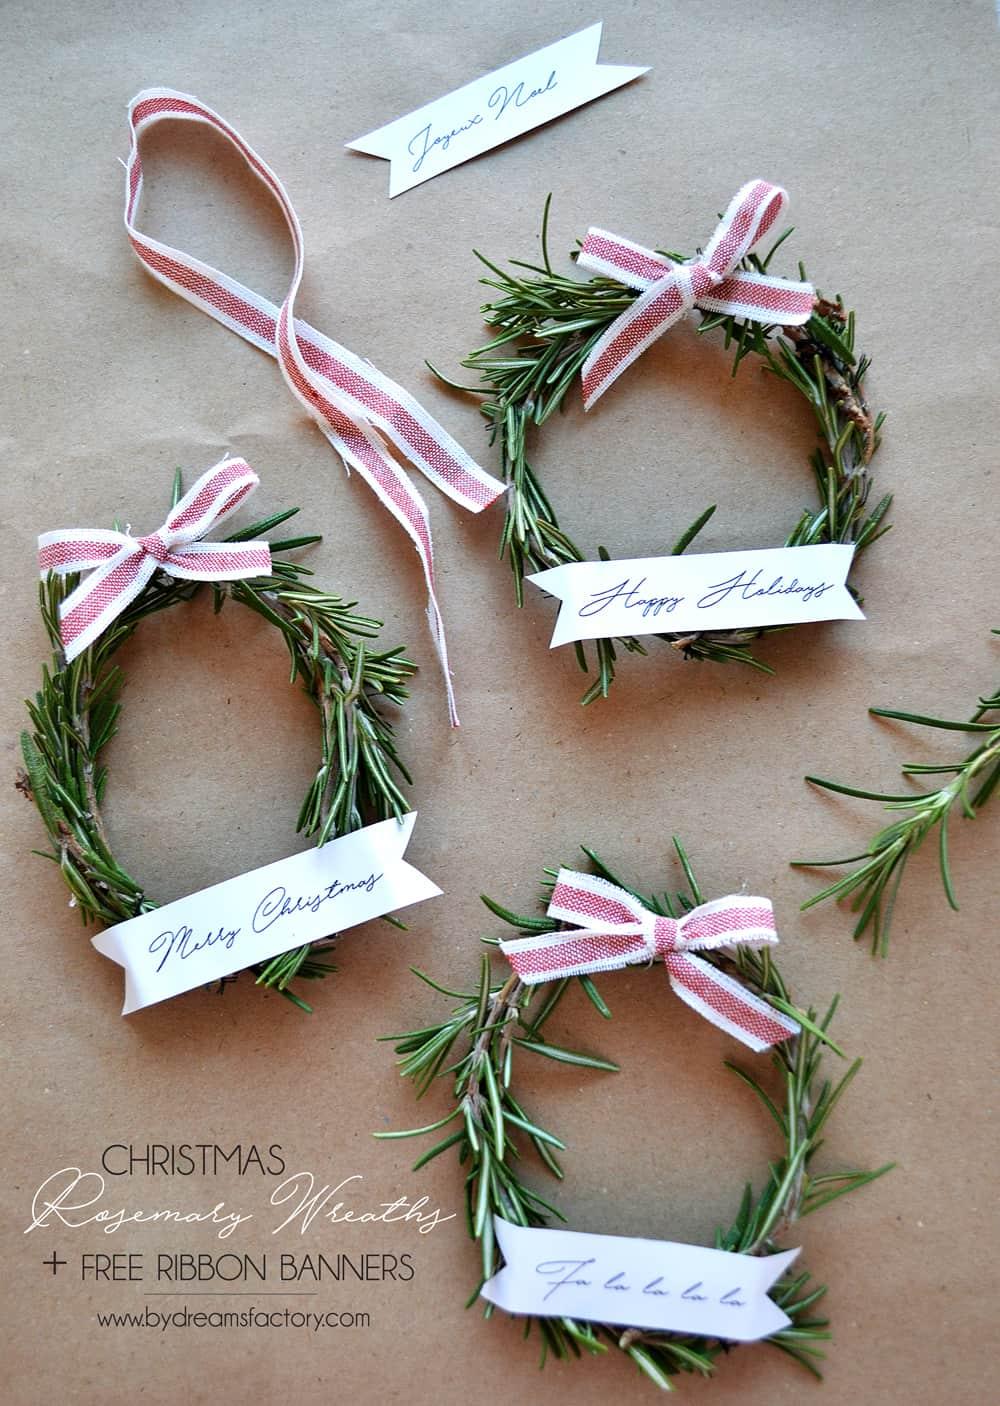 Christmas Rosemary Wreaths + Banners